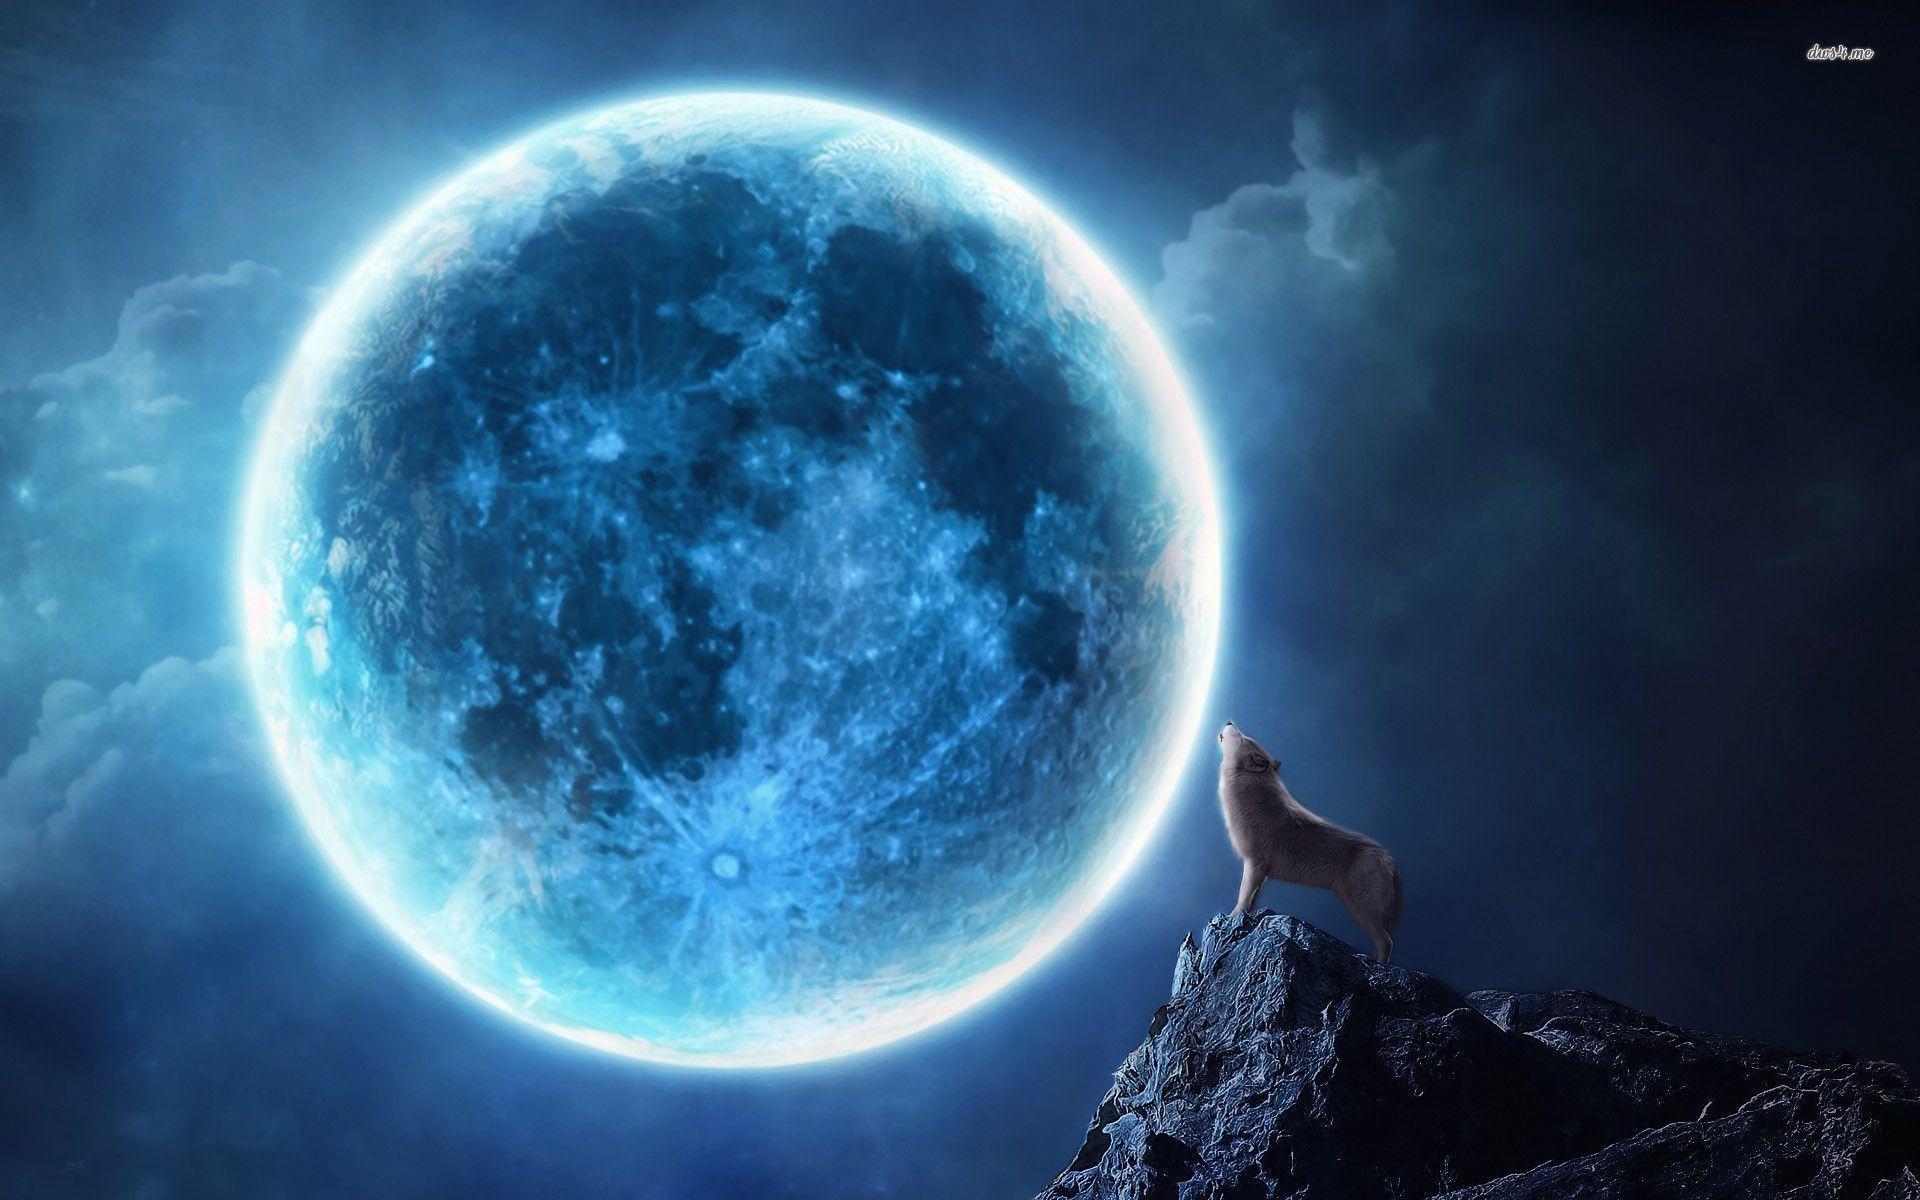 Blue Moon Wallpaper 1